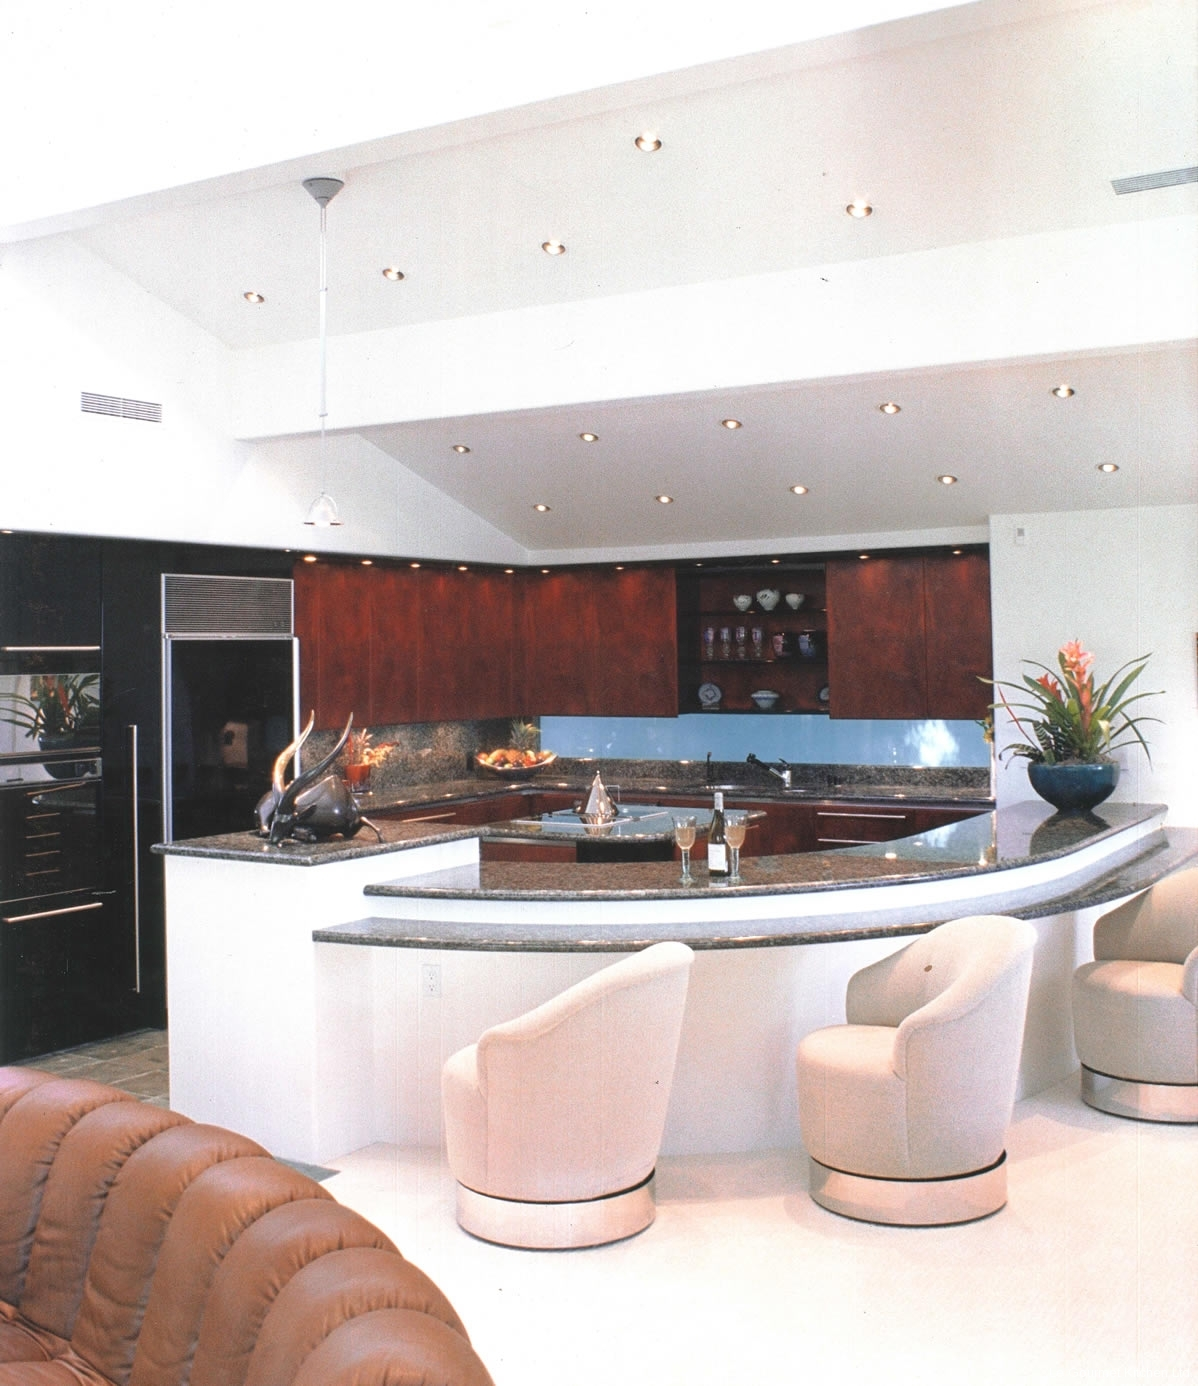 Contemporary Gallery | Le Gourmet Kitchen Ltd.